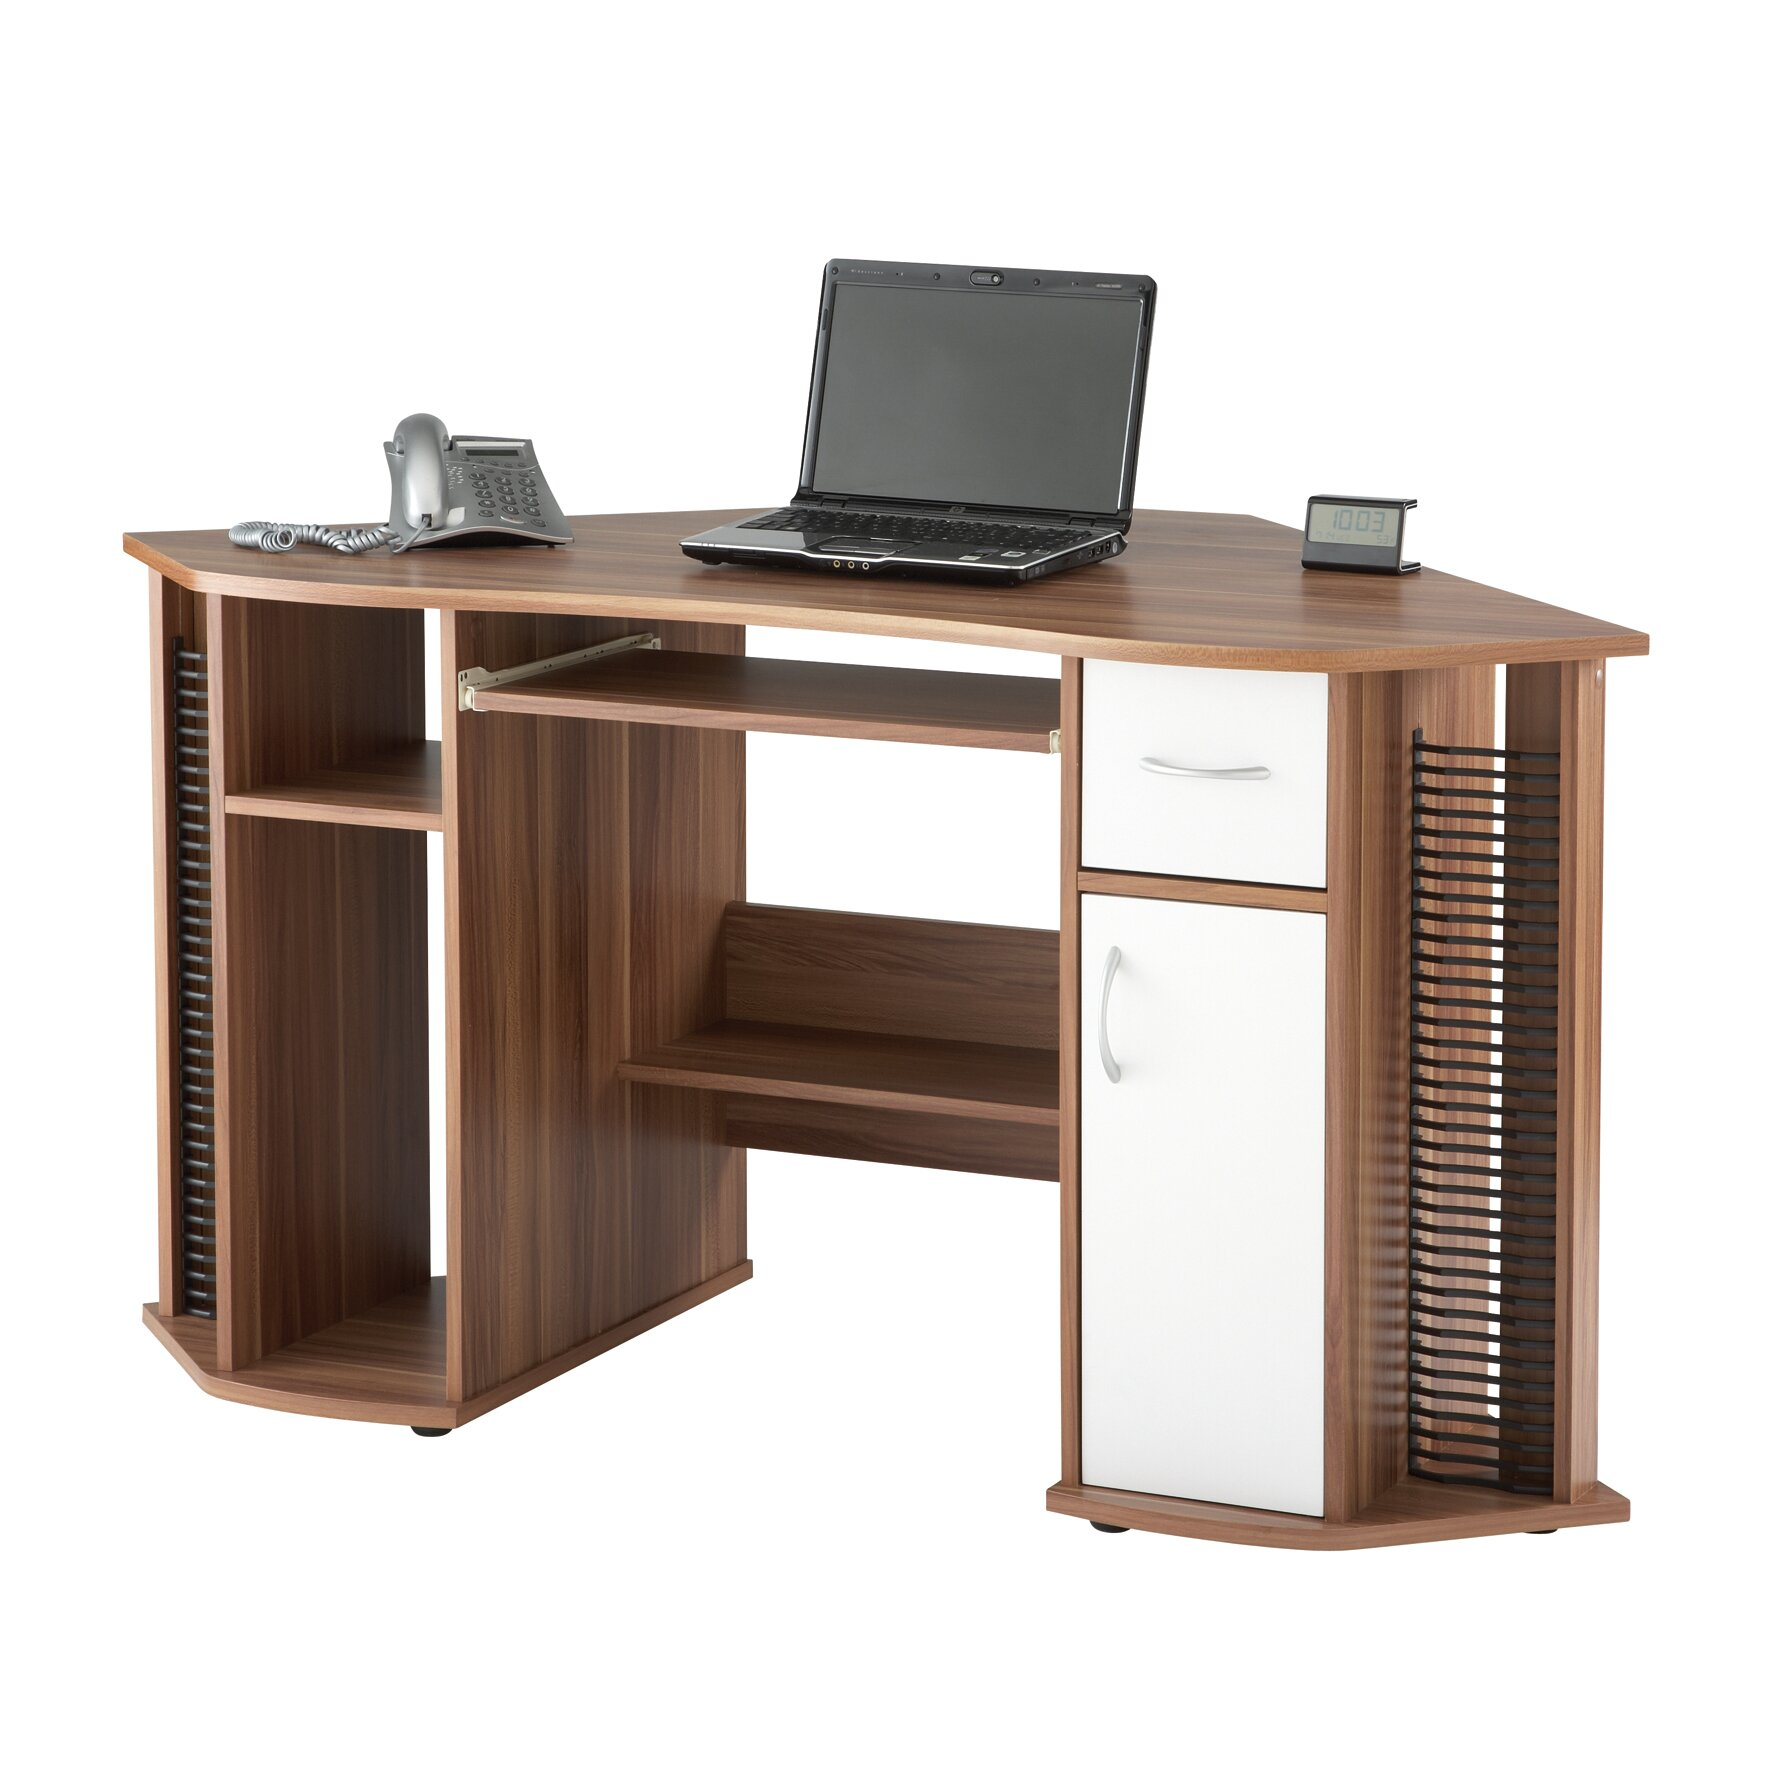 Corner Computer Desk: Home Etc Maxam Computer Desk With Keyboard Tray